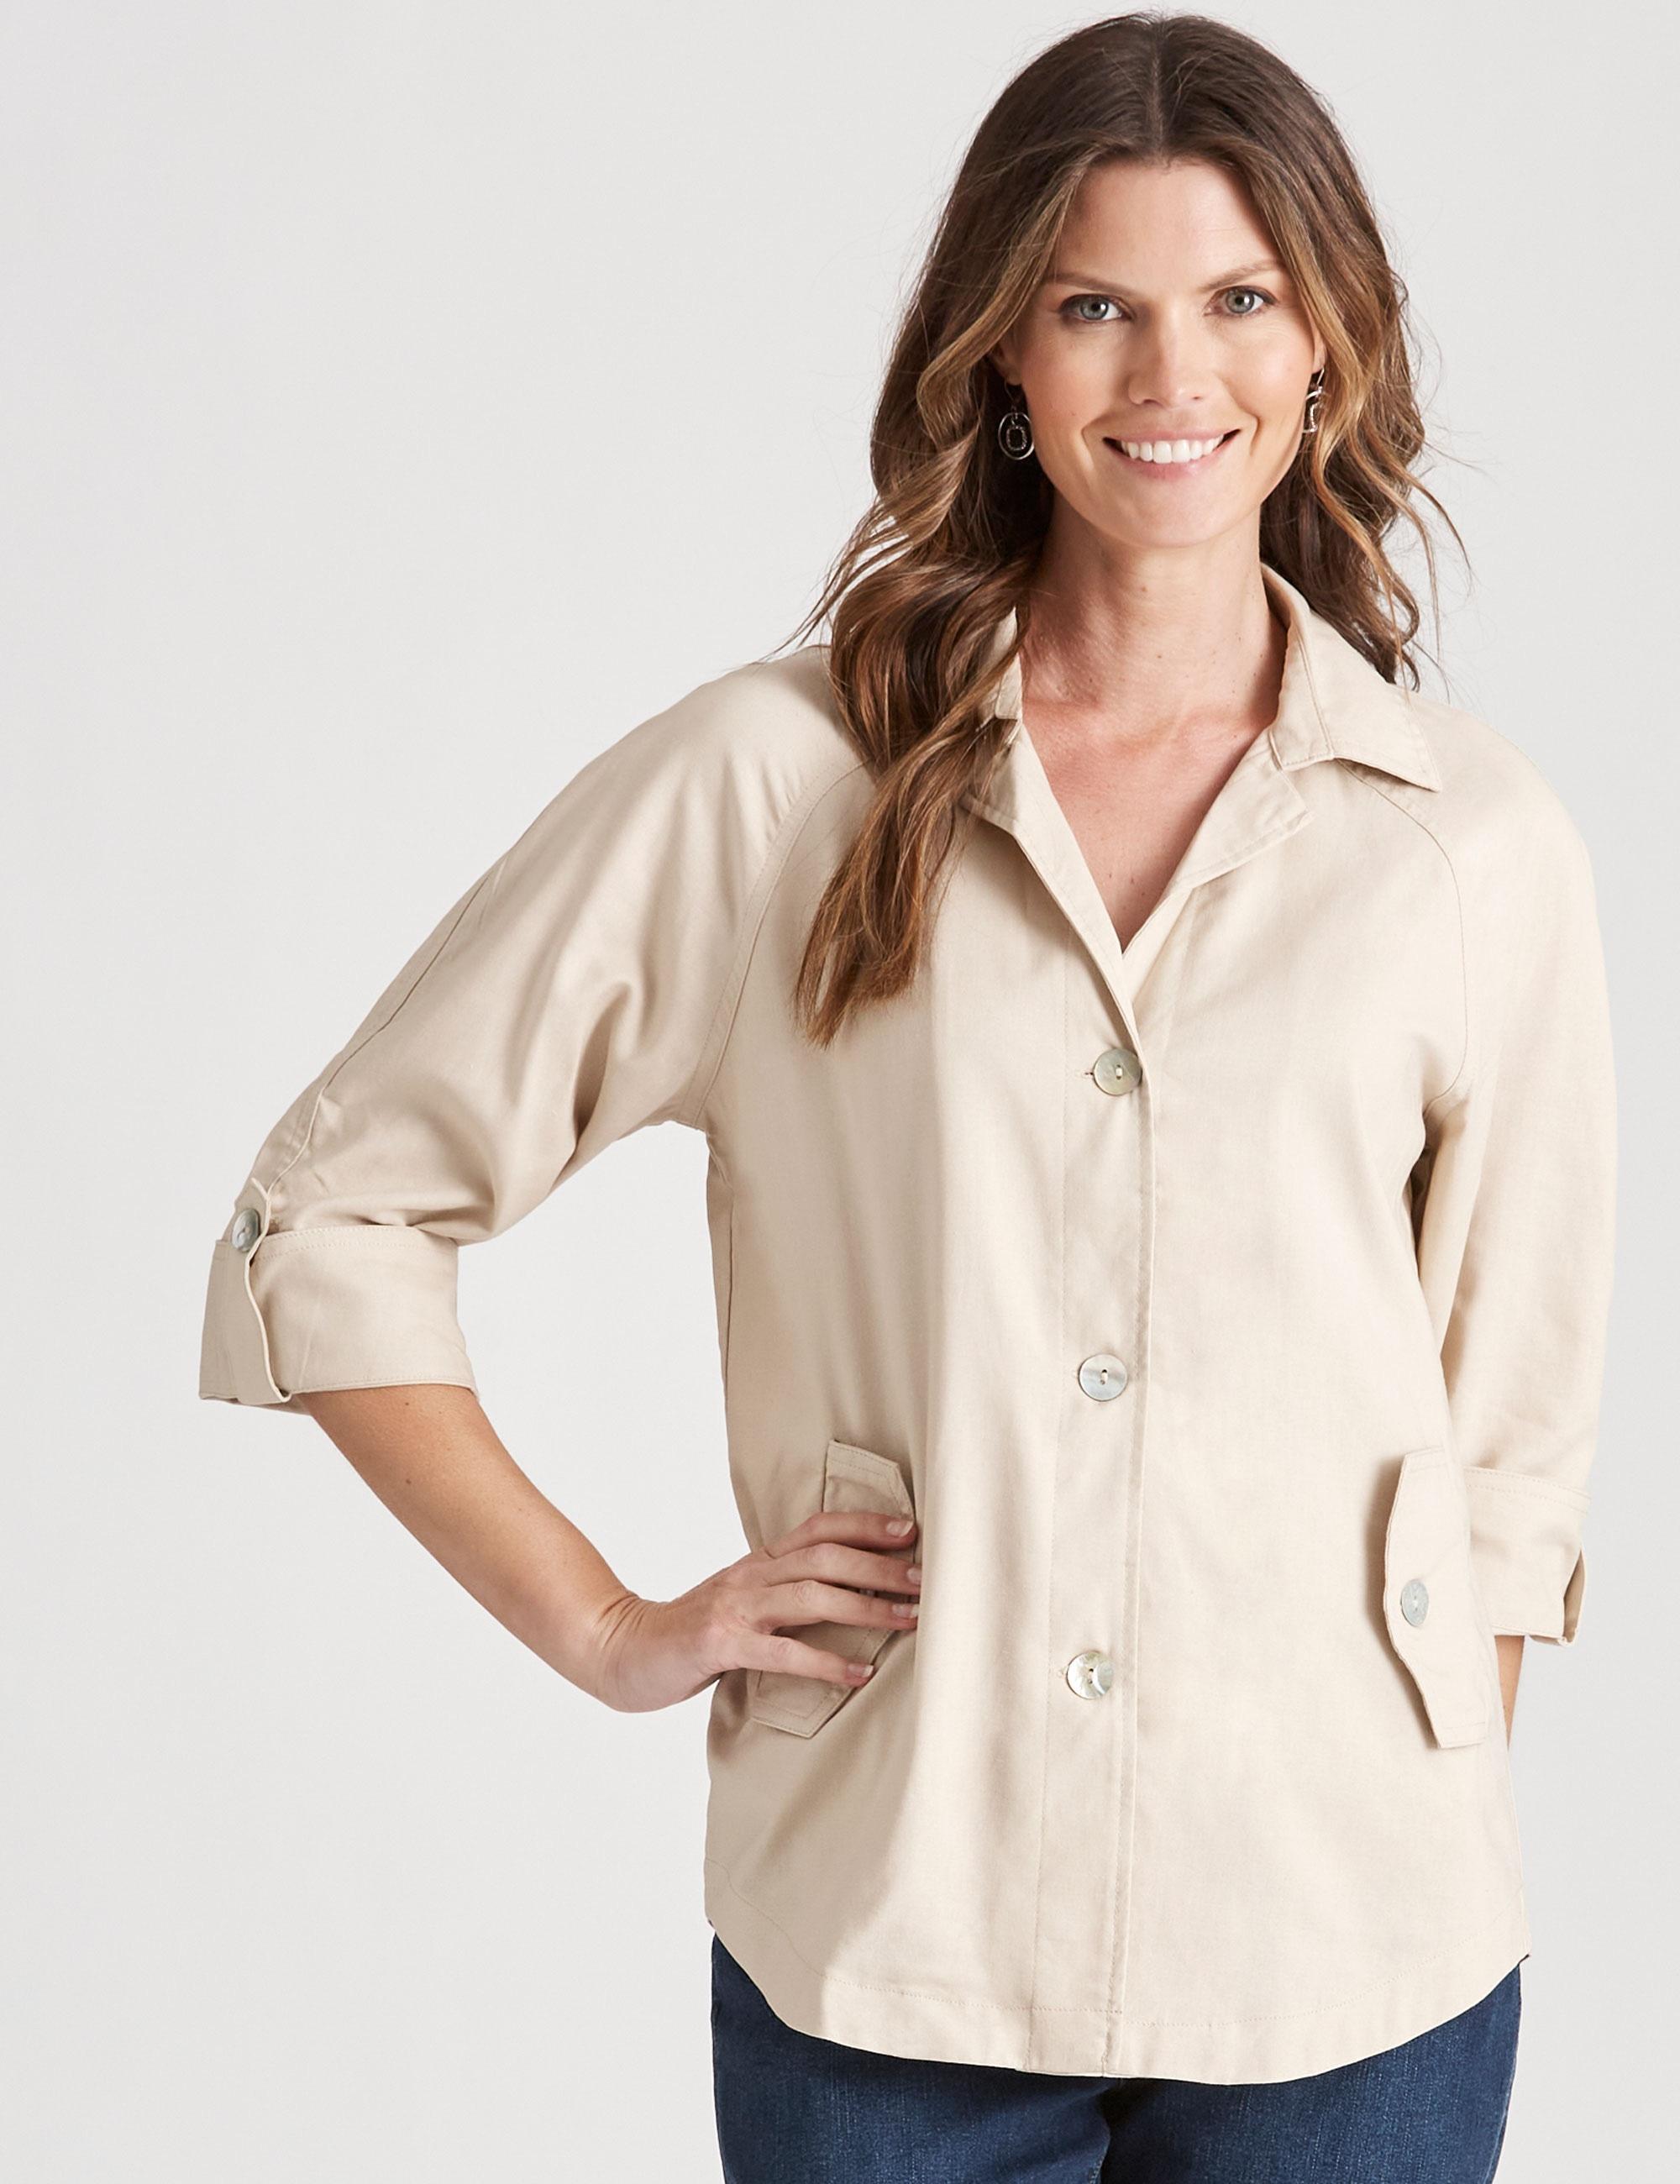 1055214310 1 - Women Fashion